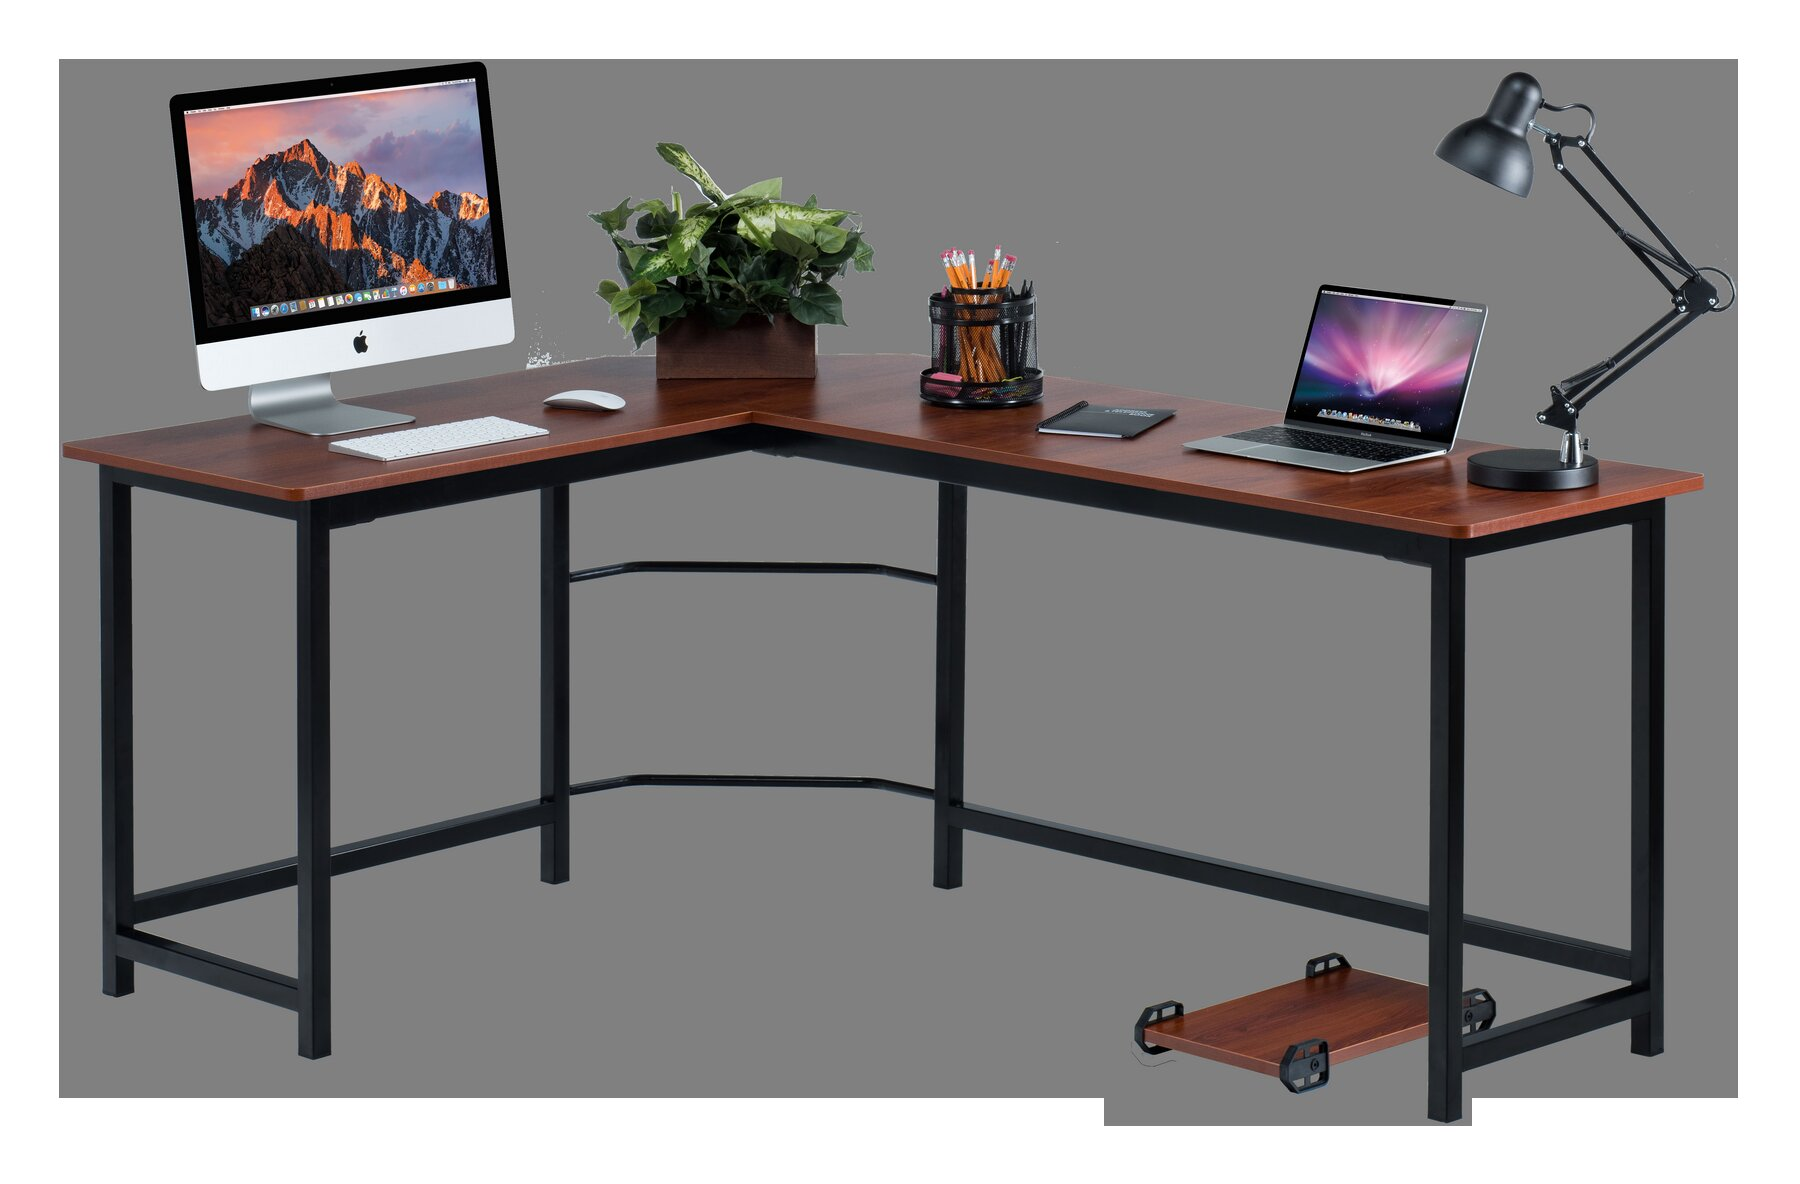 l home appliances desks walmart shaped office ace for computer vision desk top cheap at chair